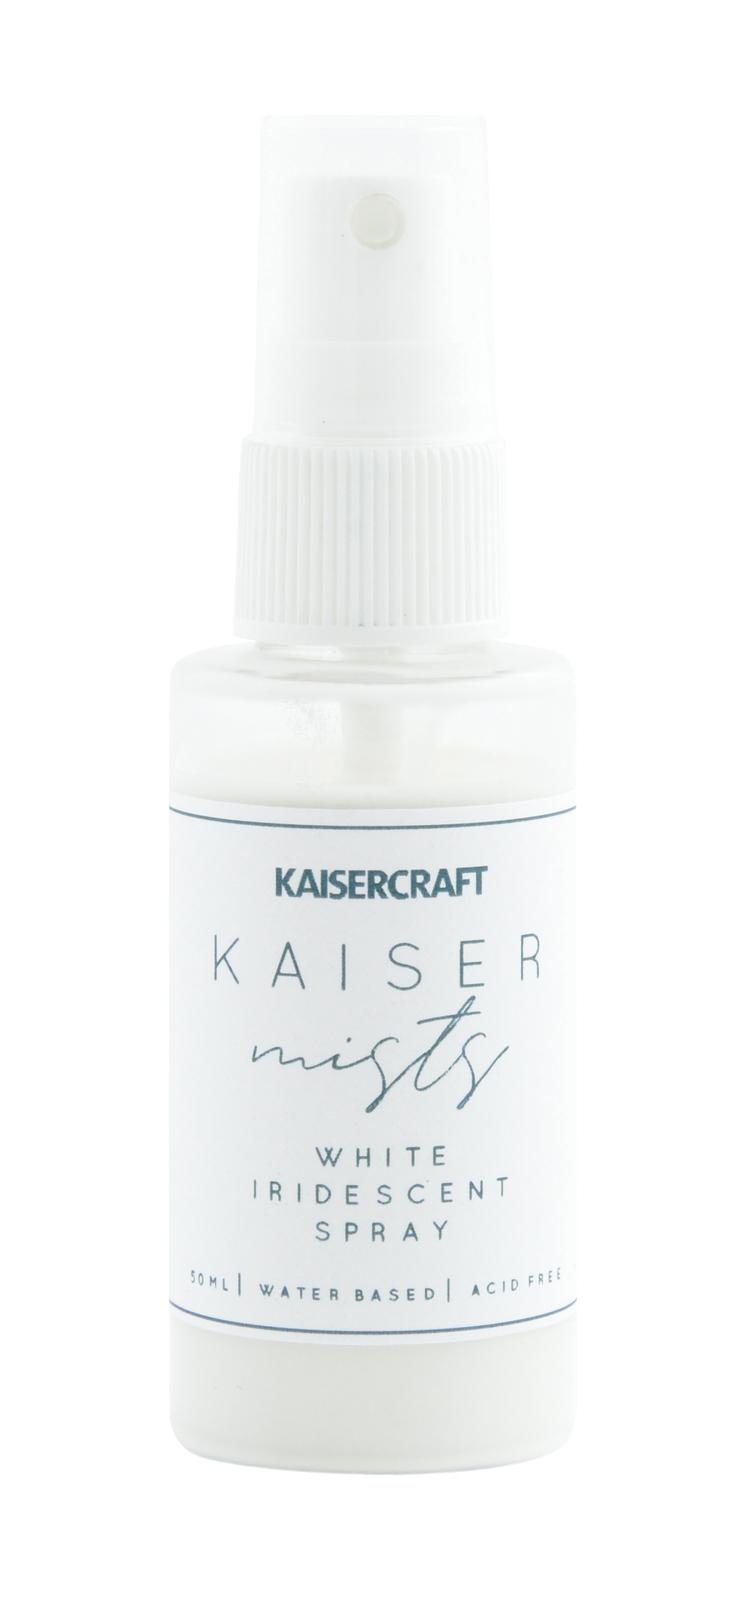 Kaisercraft: Mist - White (50ml) image